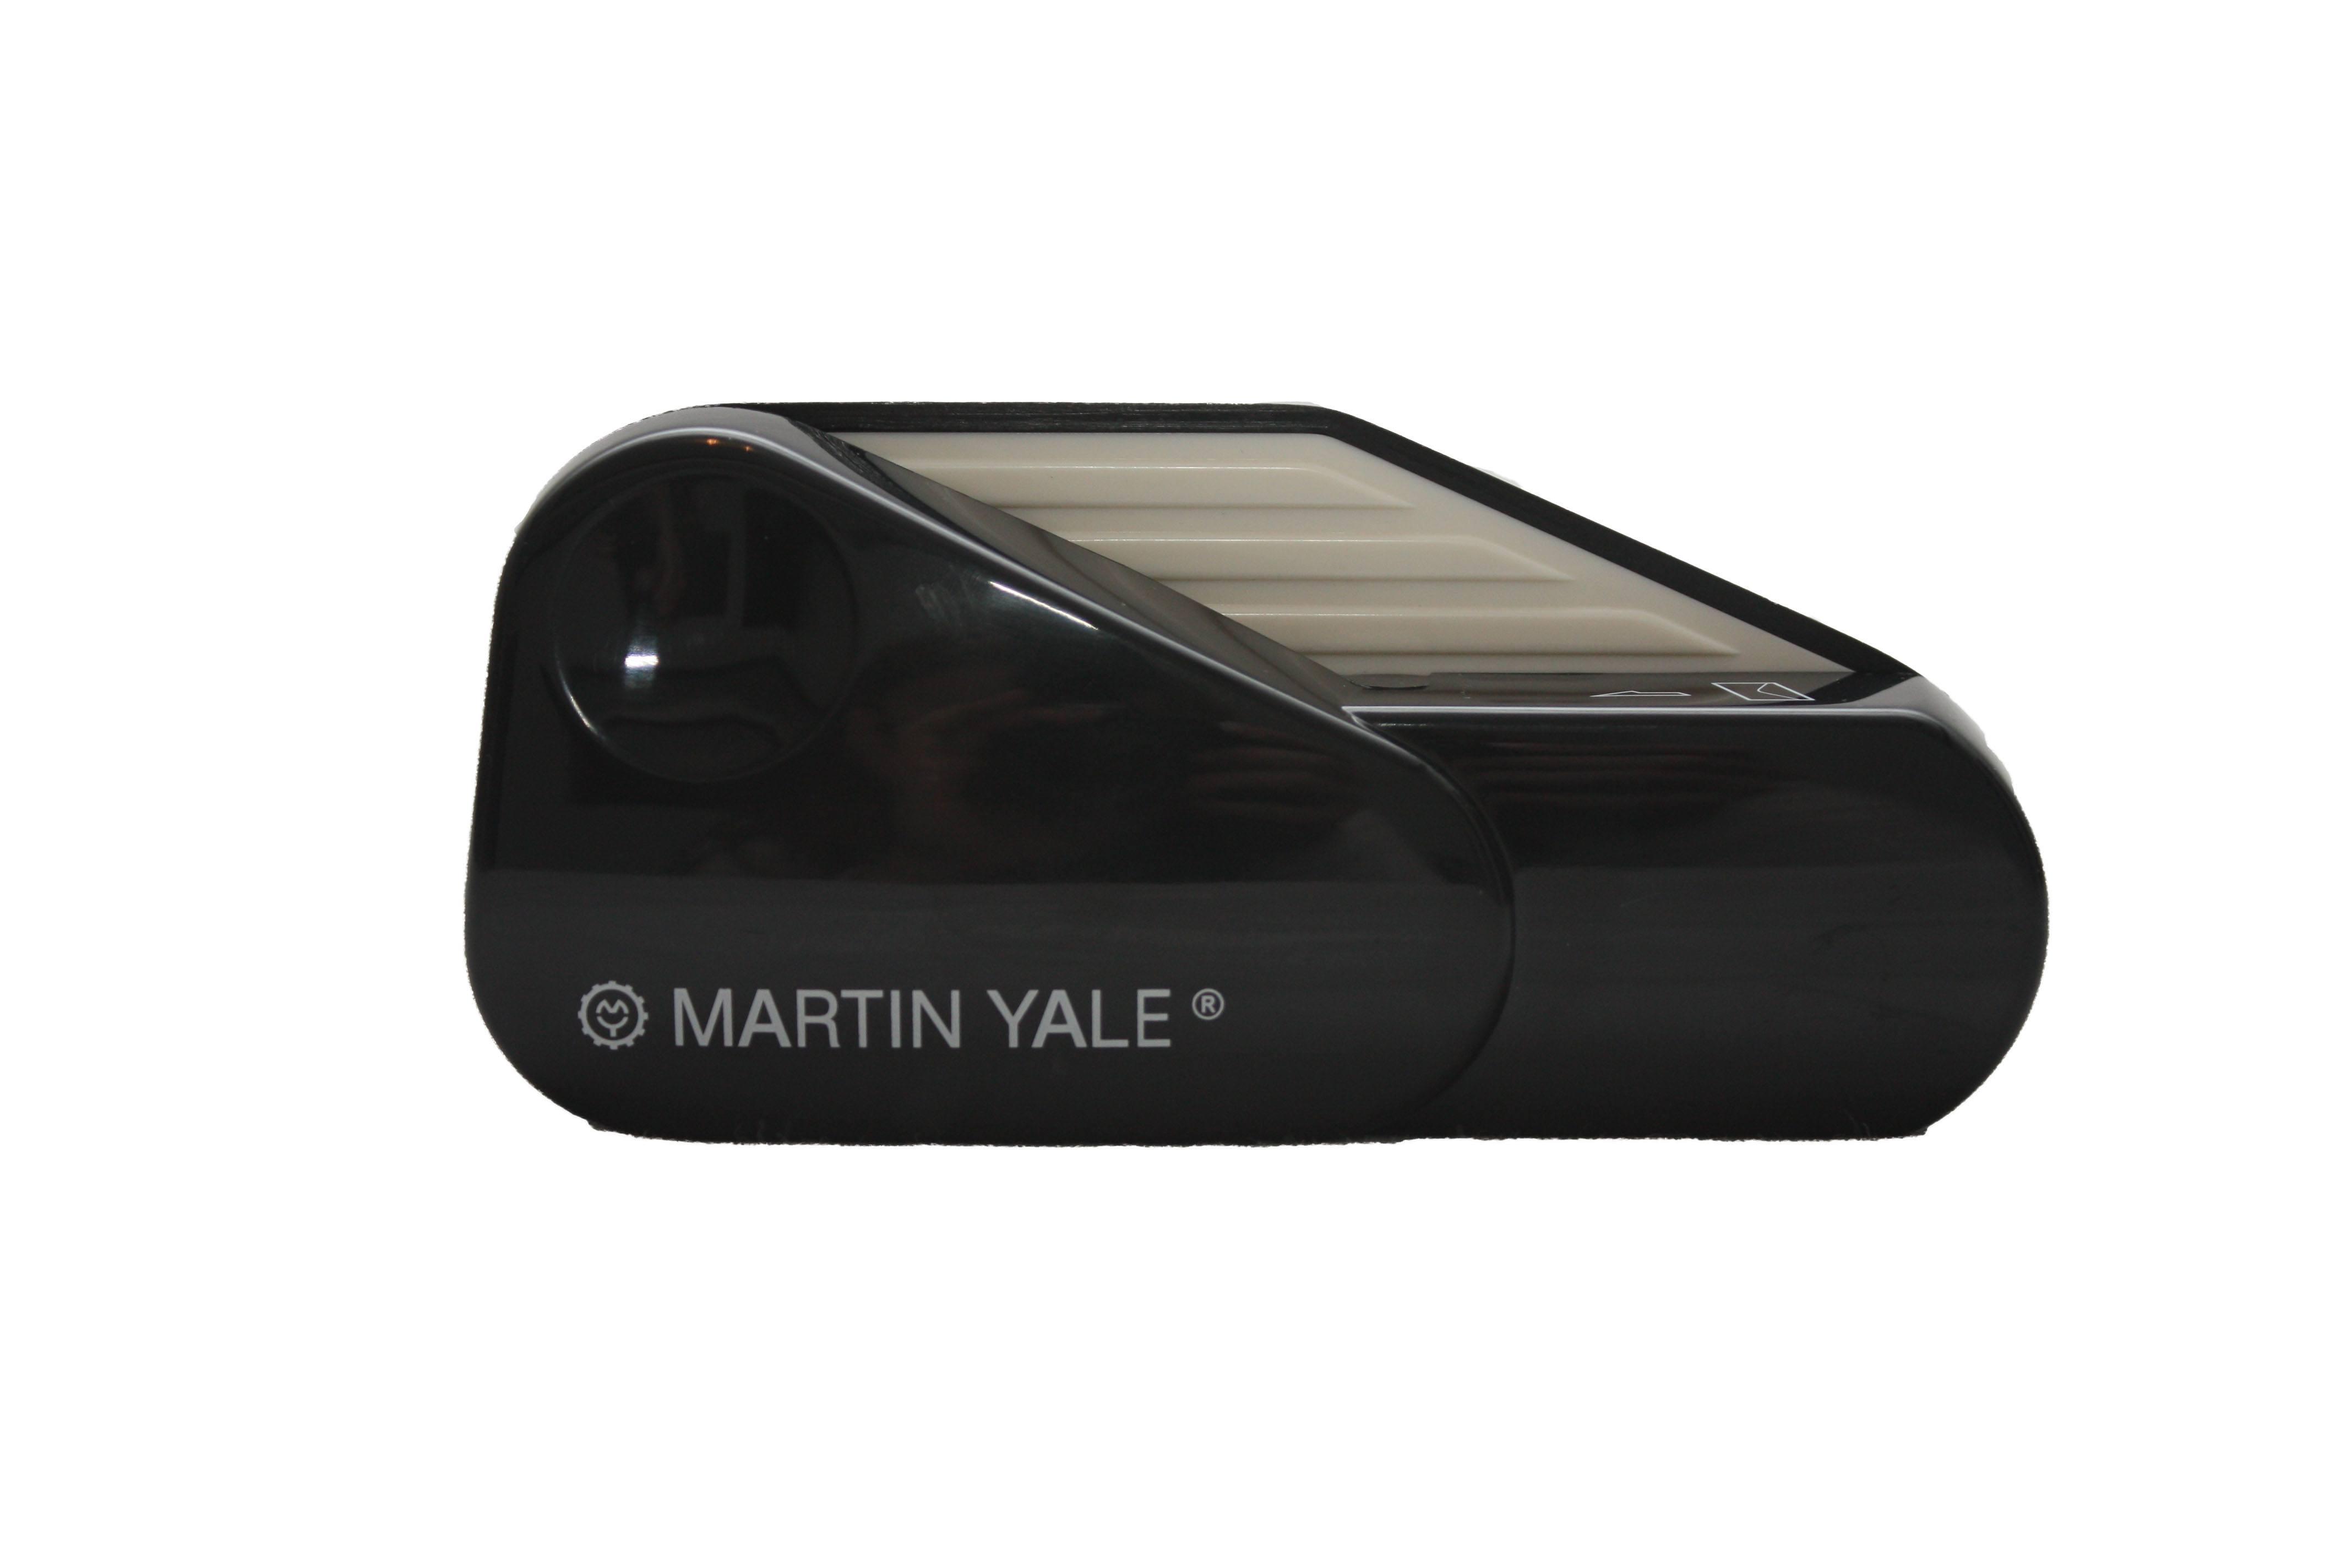 Black Martin Yale Model 1624 Handheld Battery Operated Letter Opener